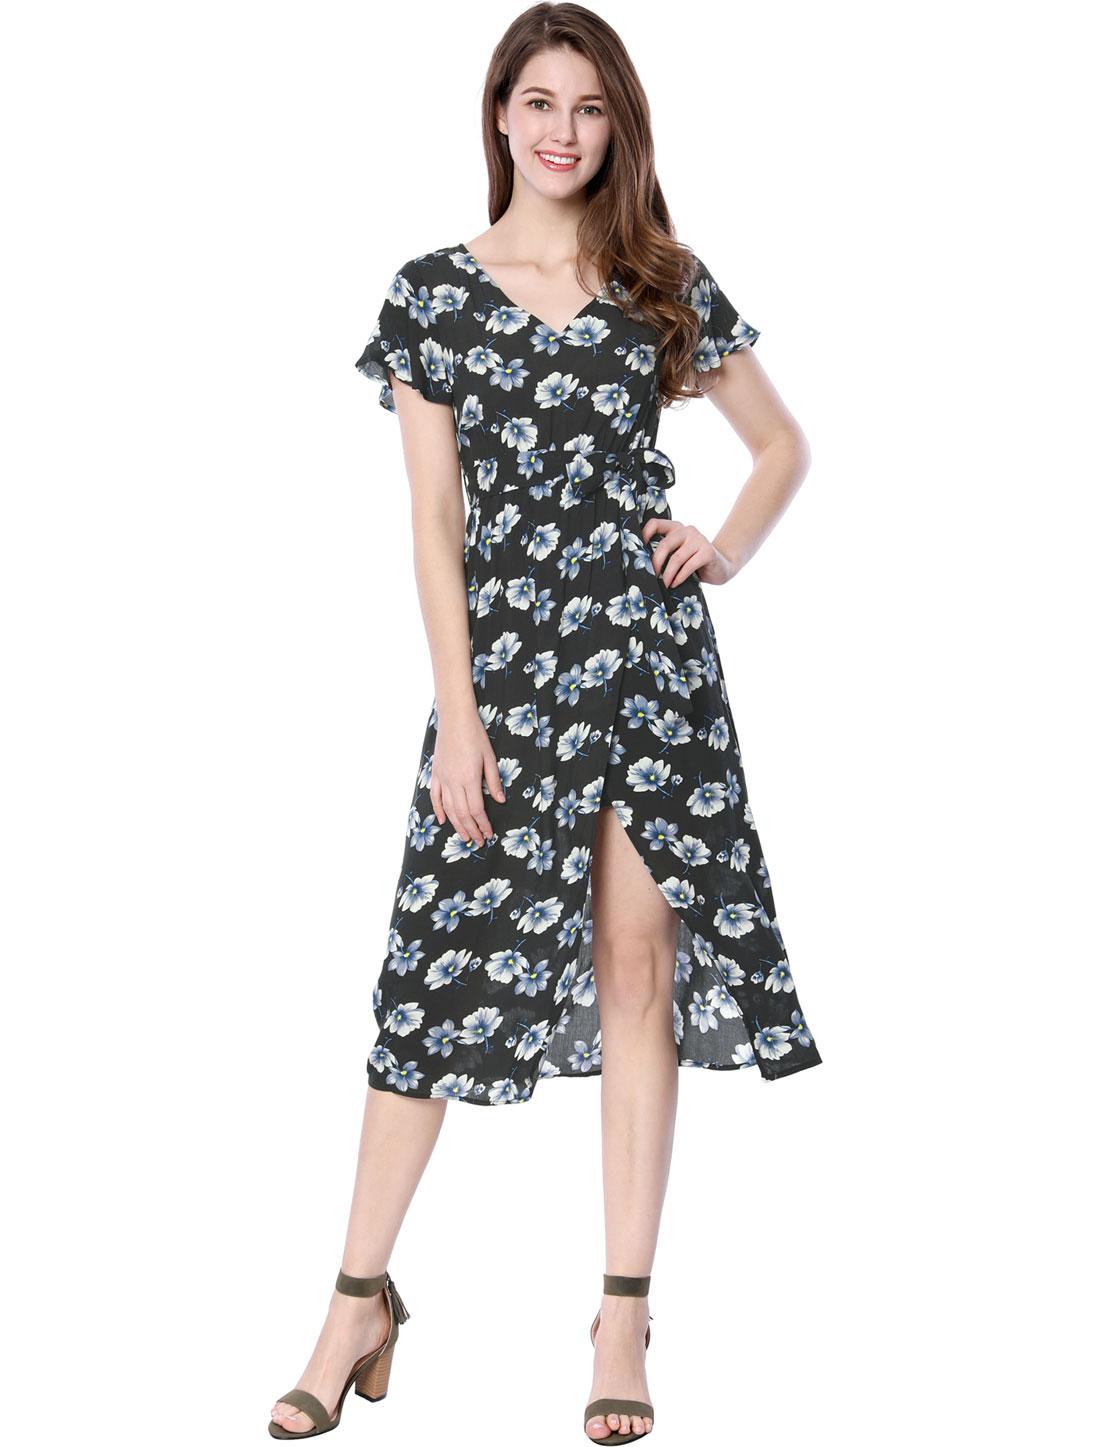 Allegra K Women V-Neck Front Slit Floral Print Midi Dress w Belt Black M